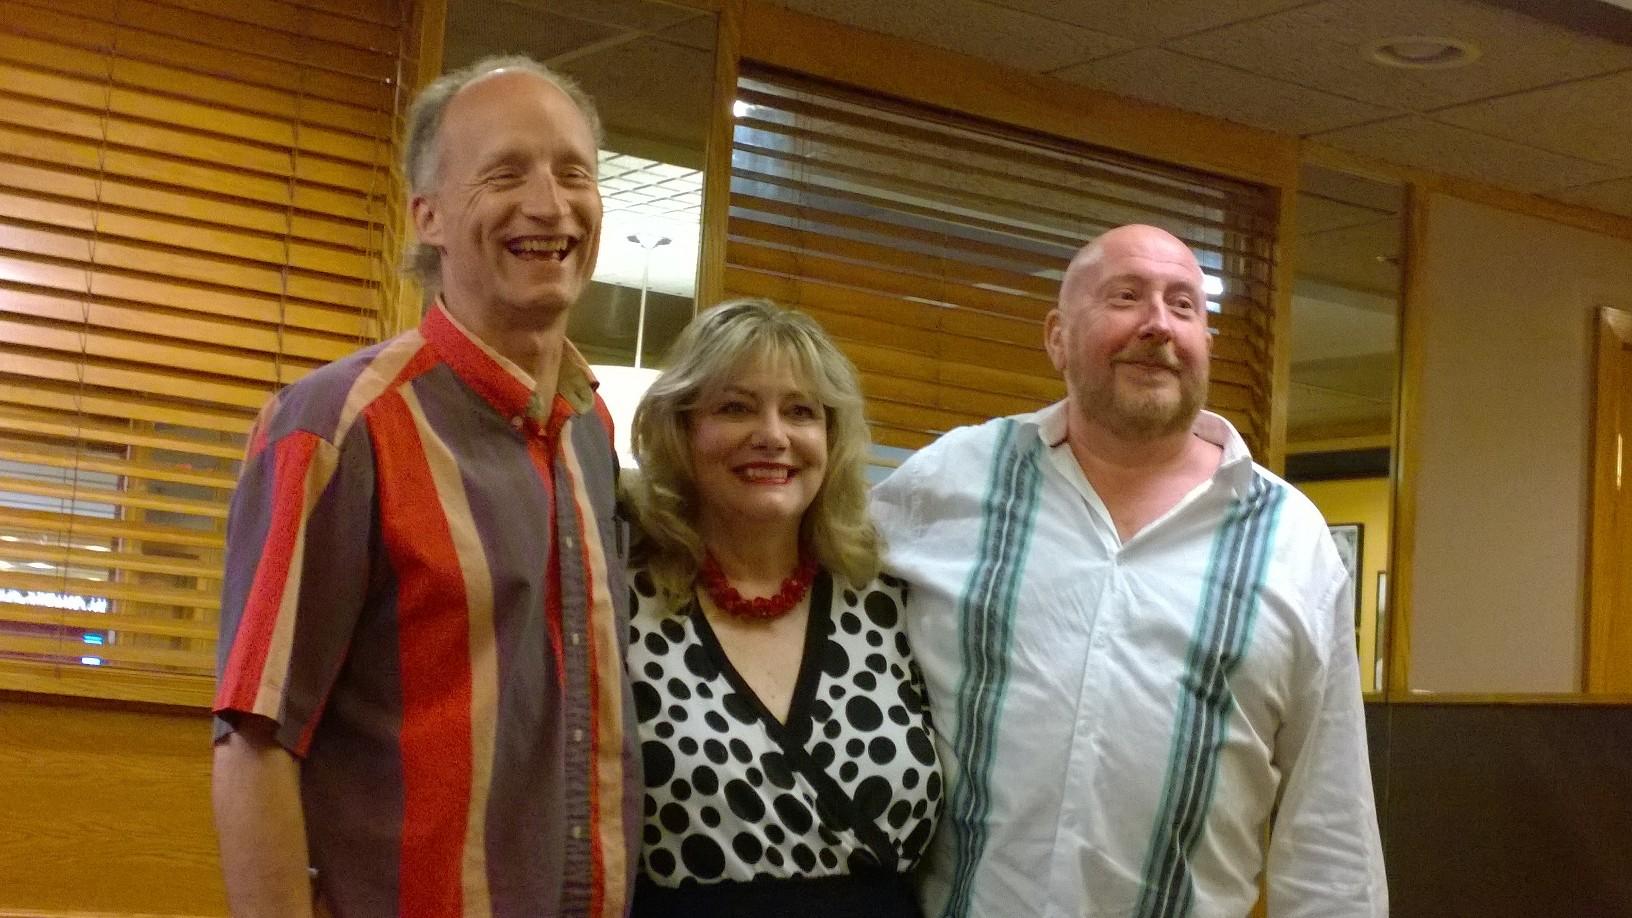 Richard O., Cynthia W., and Bill R. as The Three Headed Expert